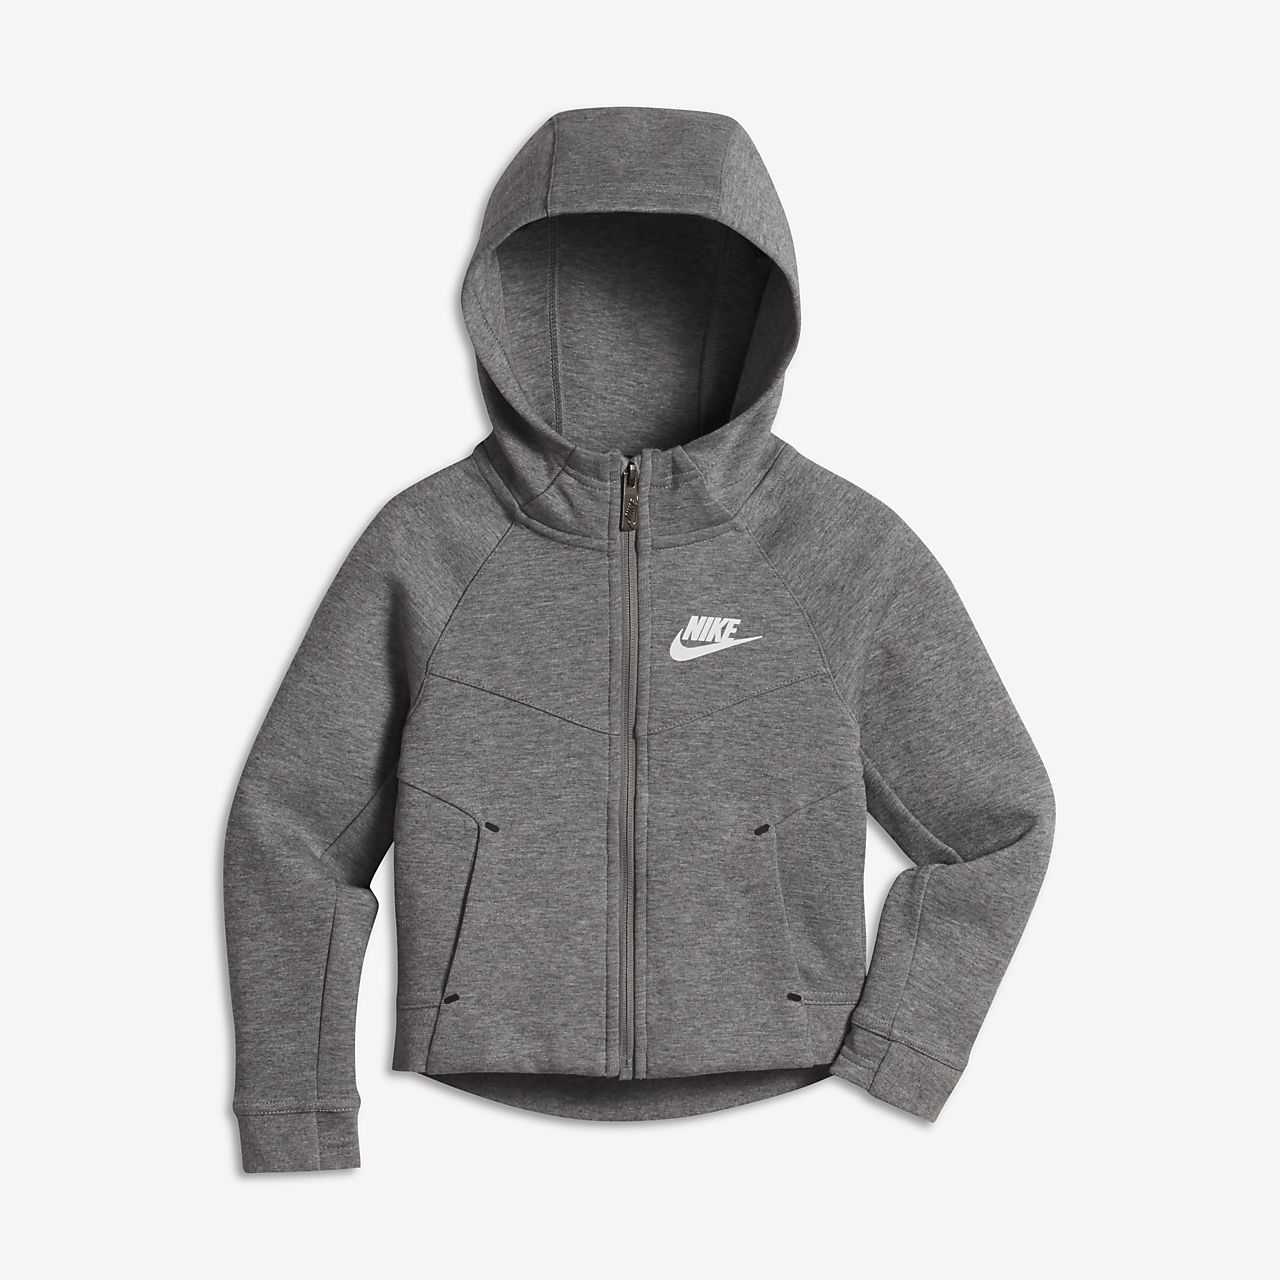 new arrival 638b9 73822 ... Sweat à capuche Nike Sportswear Tech Fleece pour Jeune fille